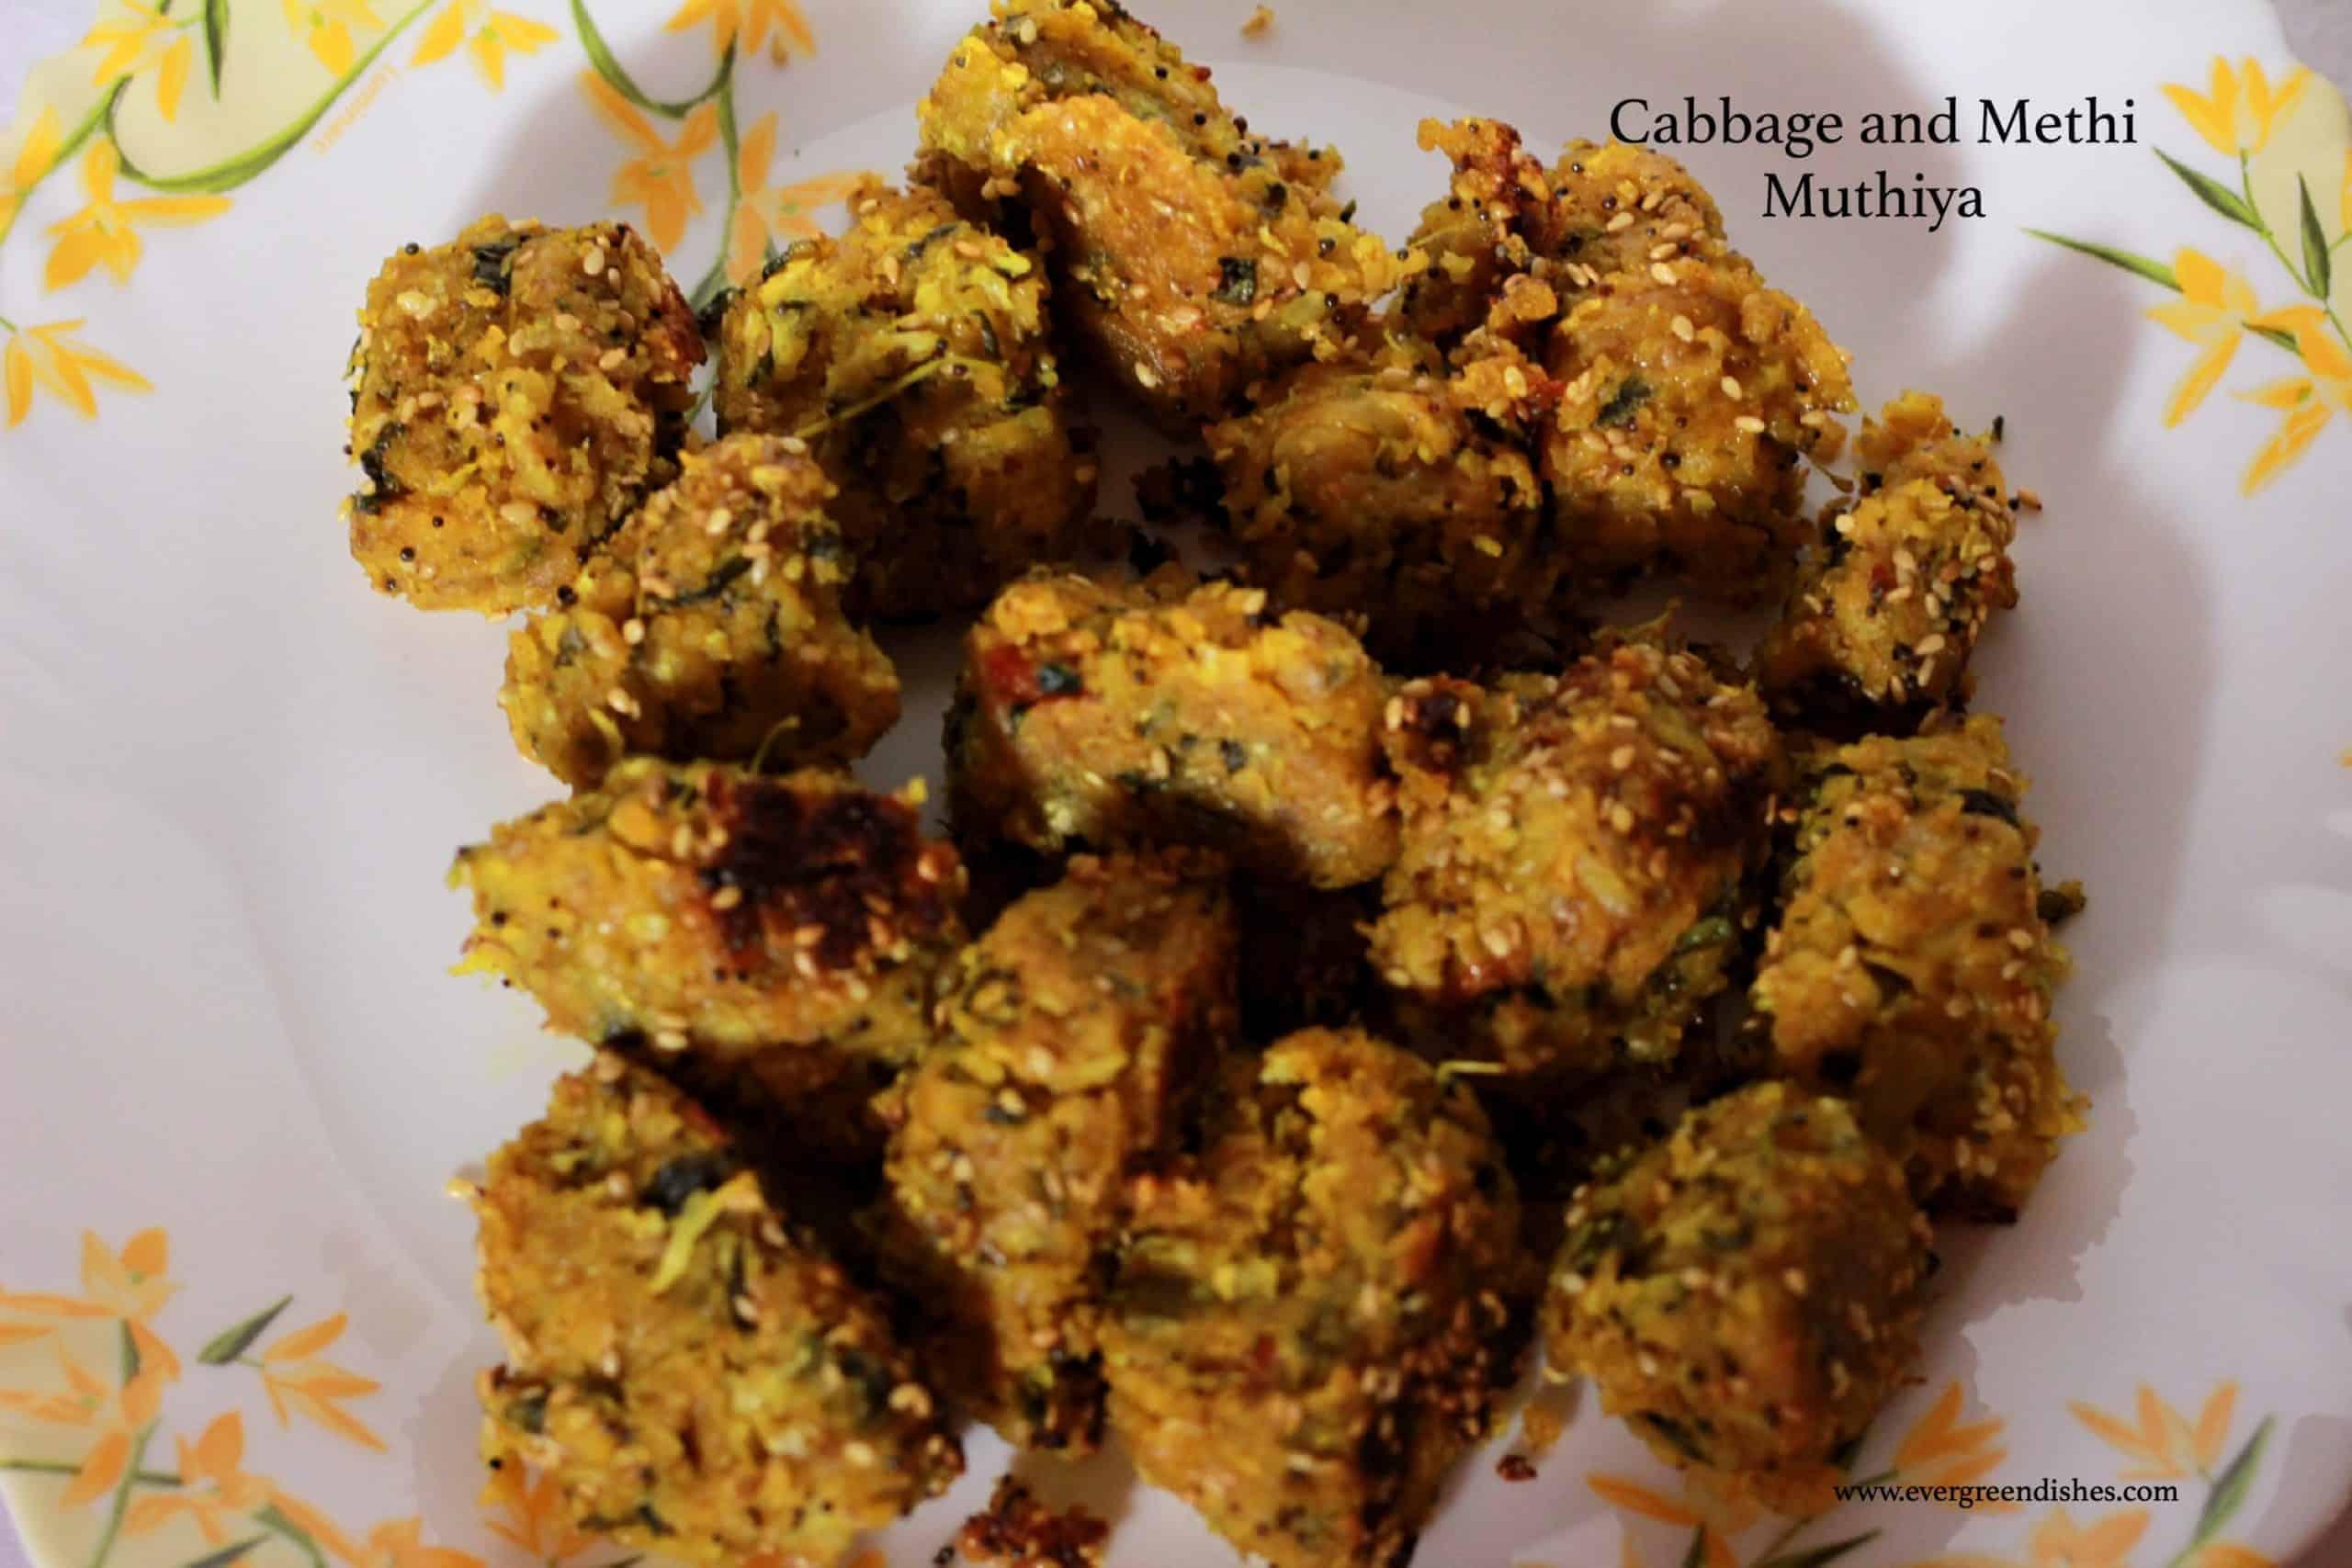 cabbage and methi muthiya